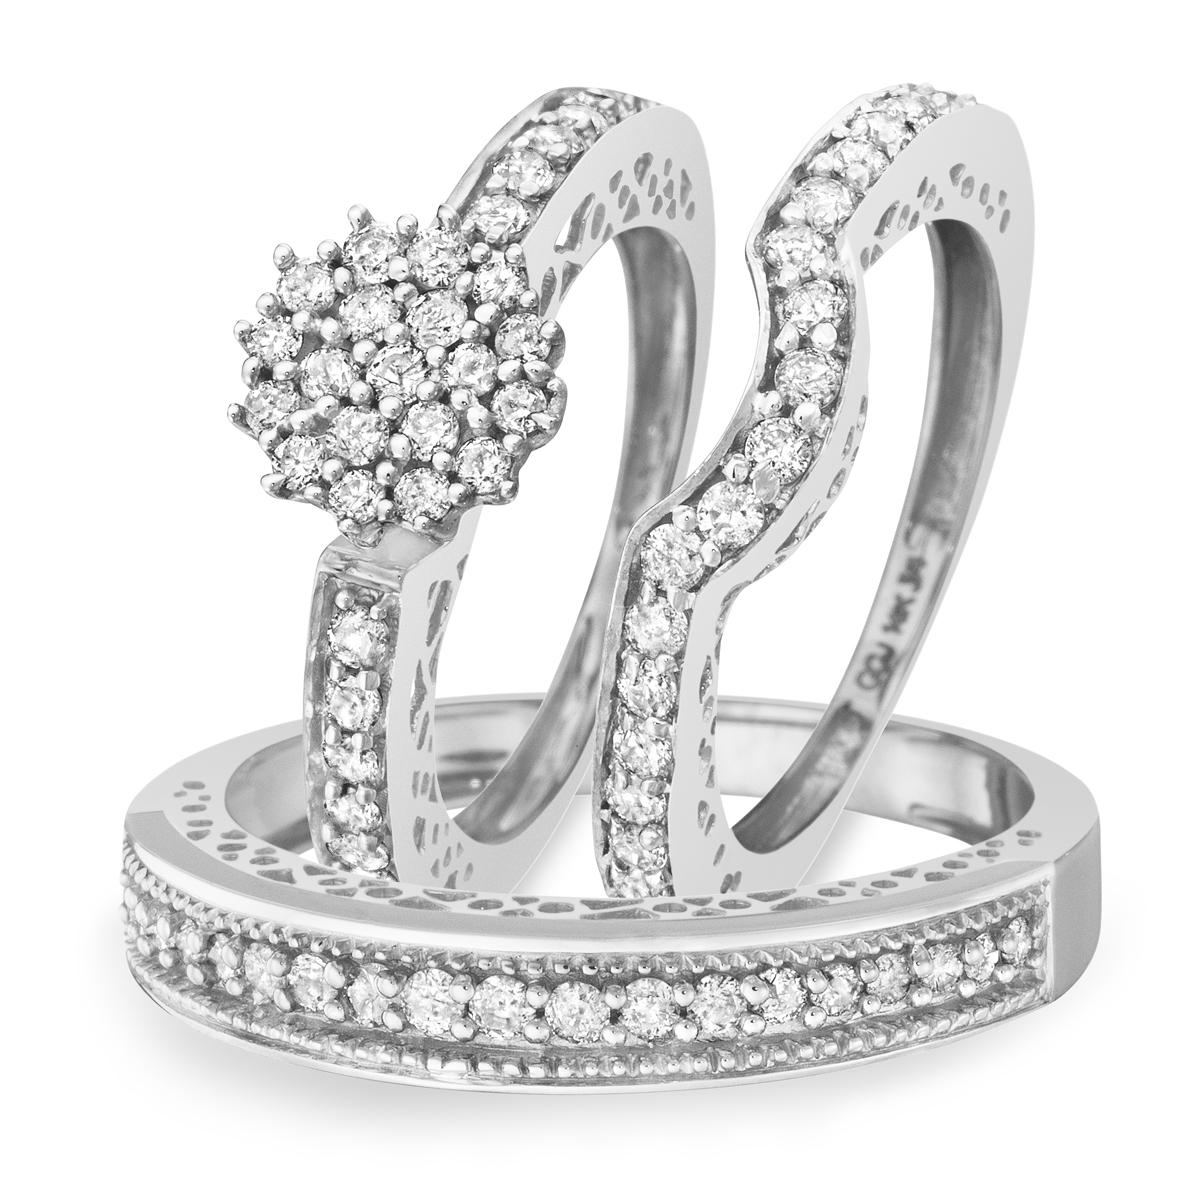 1 CT. T.W. Round Cut Diamond Women's Engagement Ring, Ladies Wedding Band, Men's